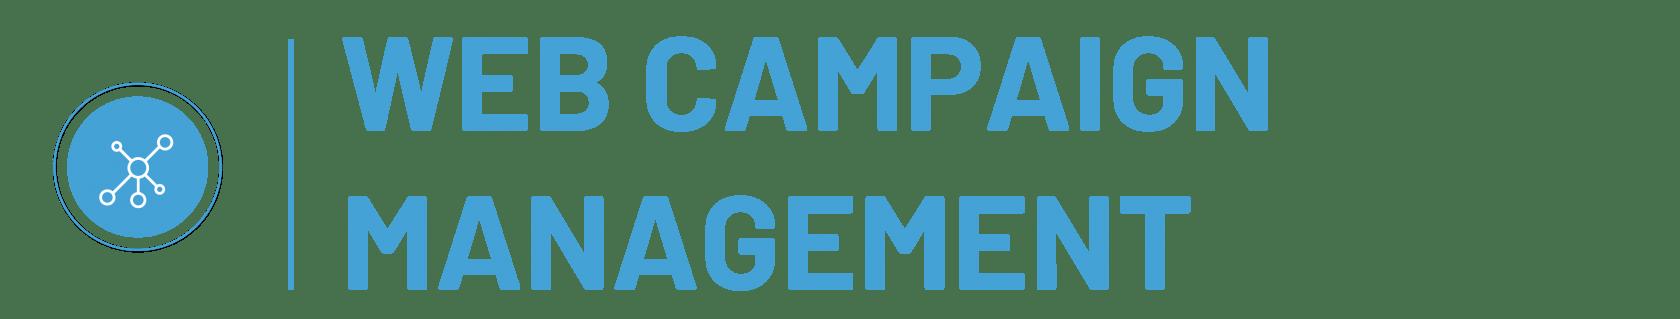 Header WEBCAMPAIGNMANAGEMENTcerchio-01